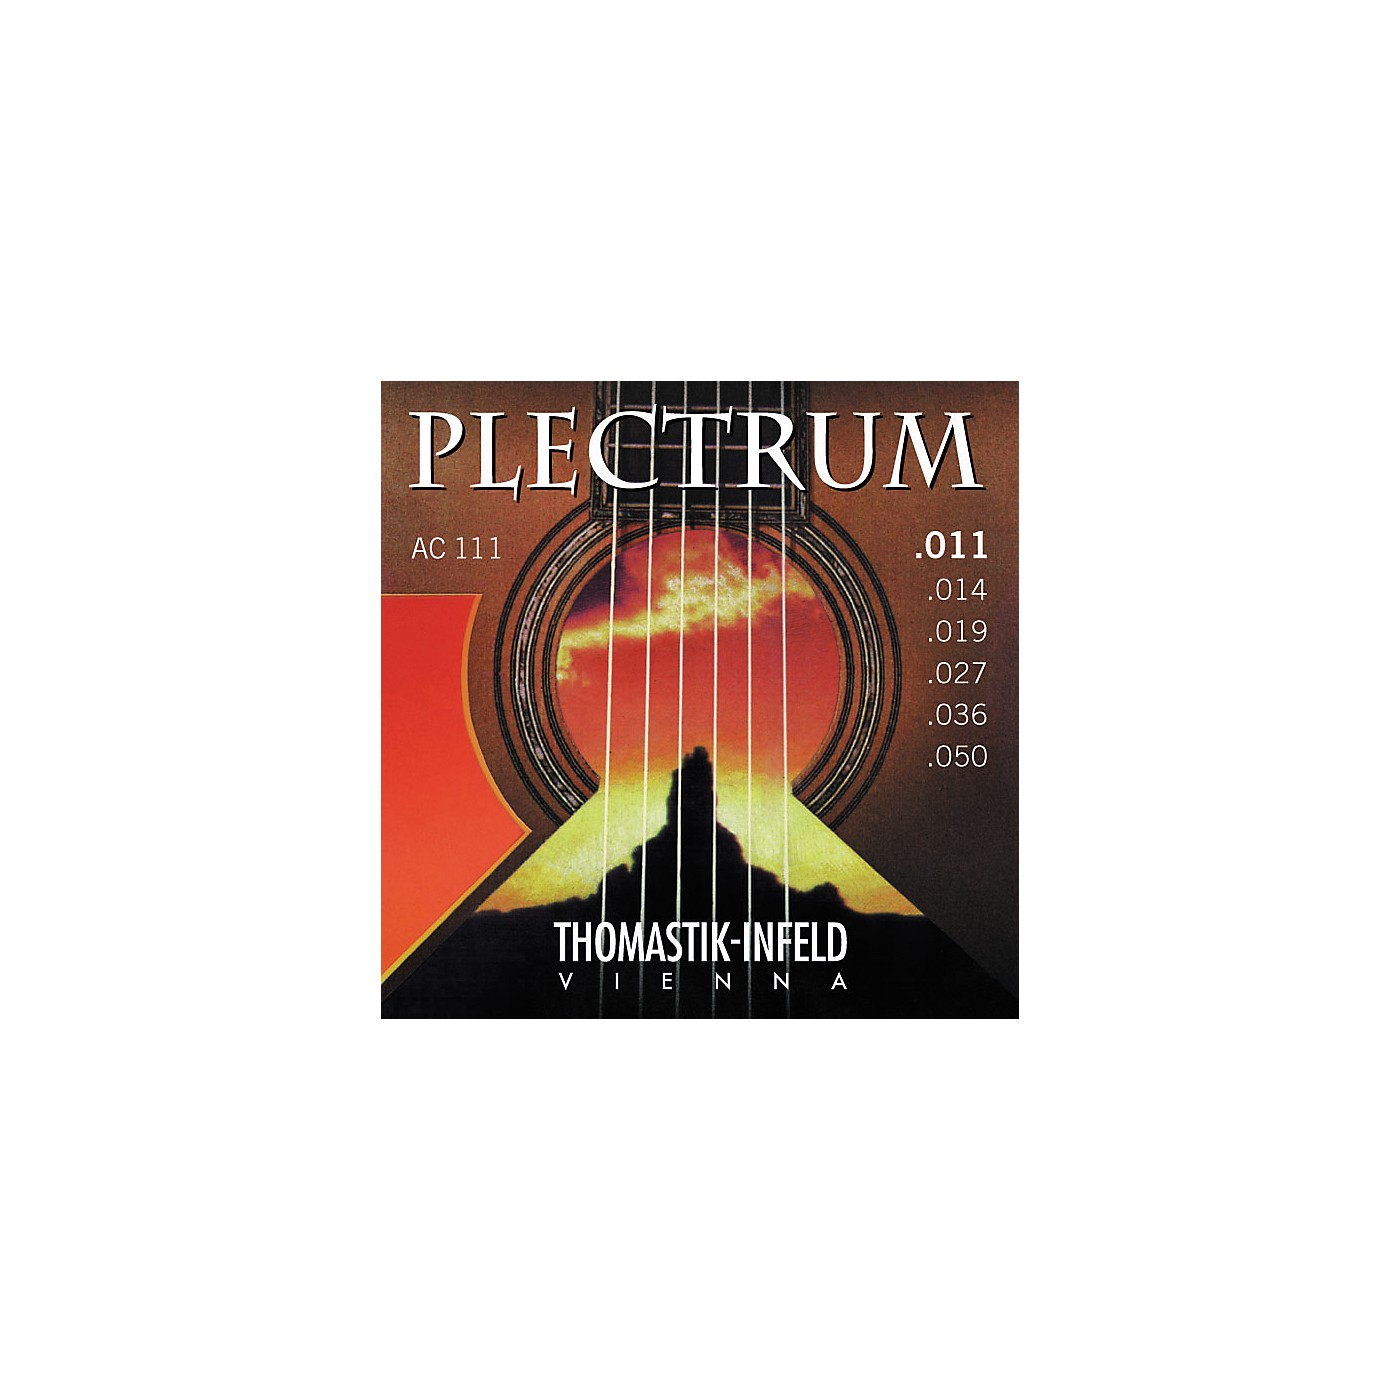 Thomastik AC111 Plectrum Bronze Acoustic Guitar Strings - Light thumbnail